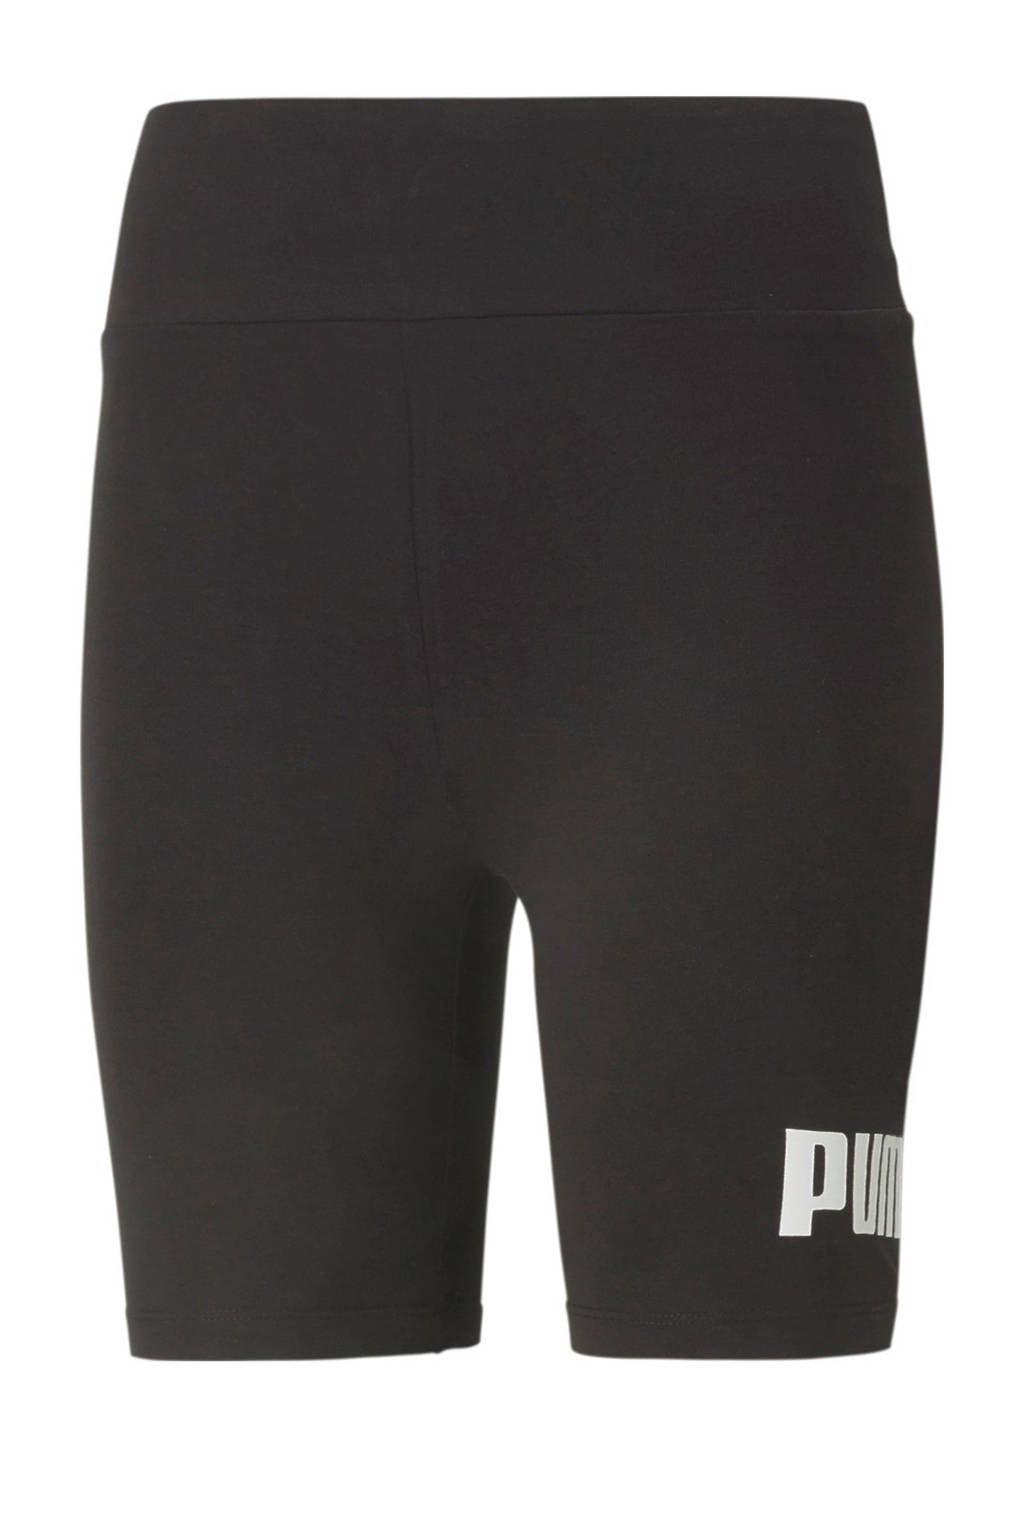 Puma high waist slim fit broek met logo zwart, Zwart